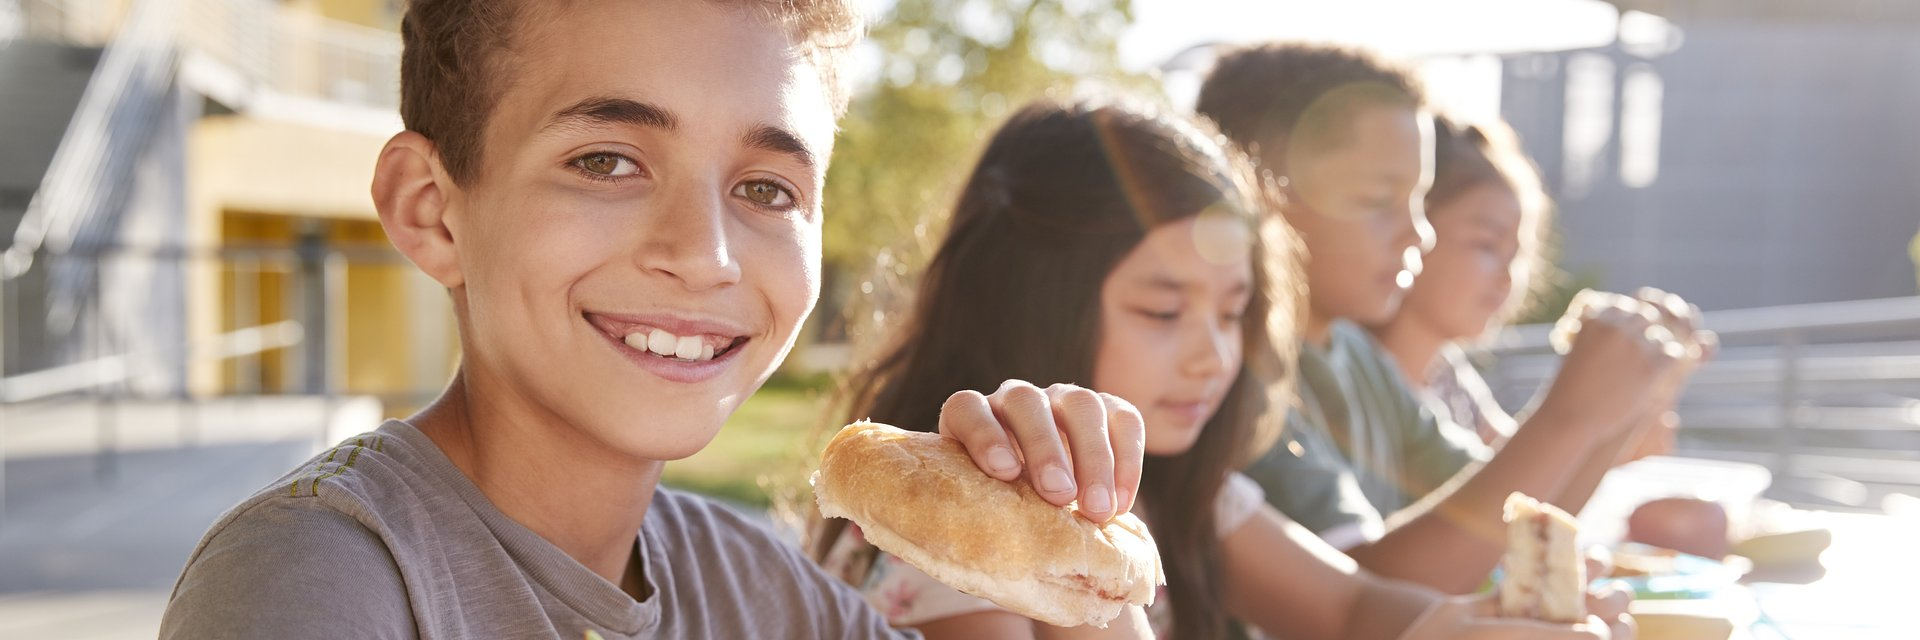 School Lunch Ideas & Options